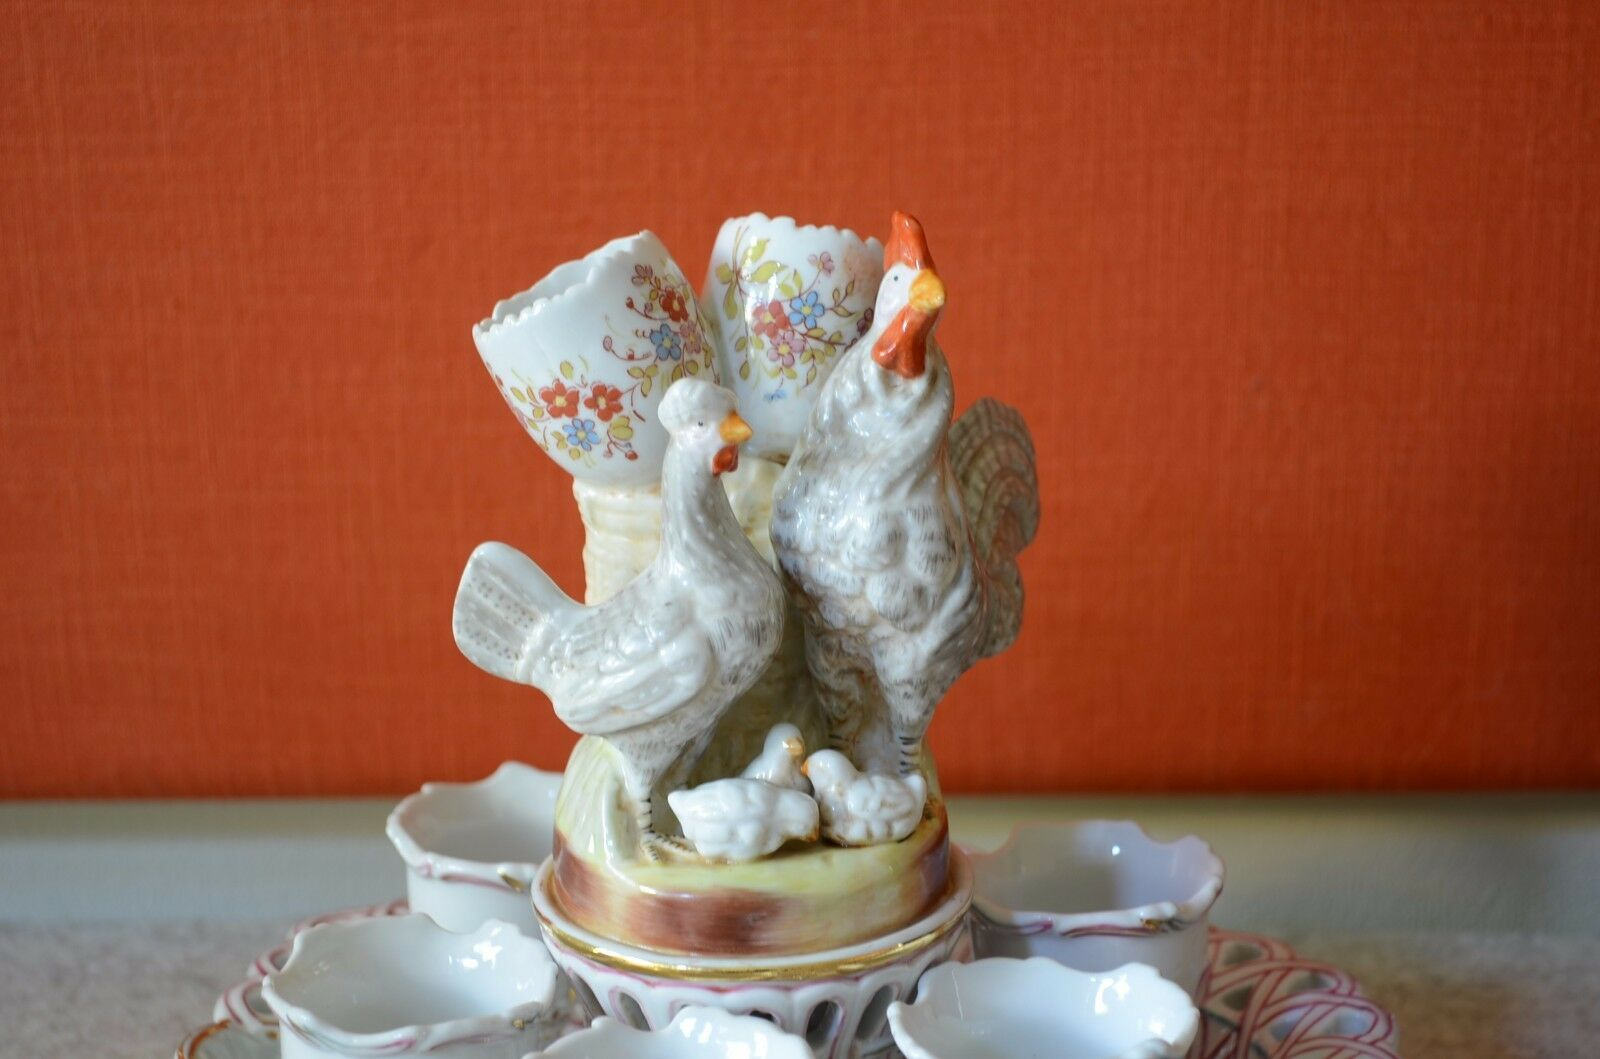 Porcellana eierbecherhalter kronenmarke 6 pezzi